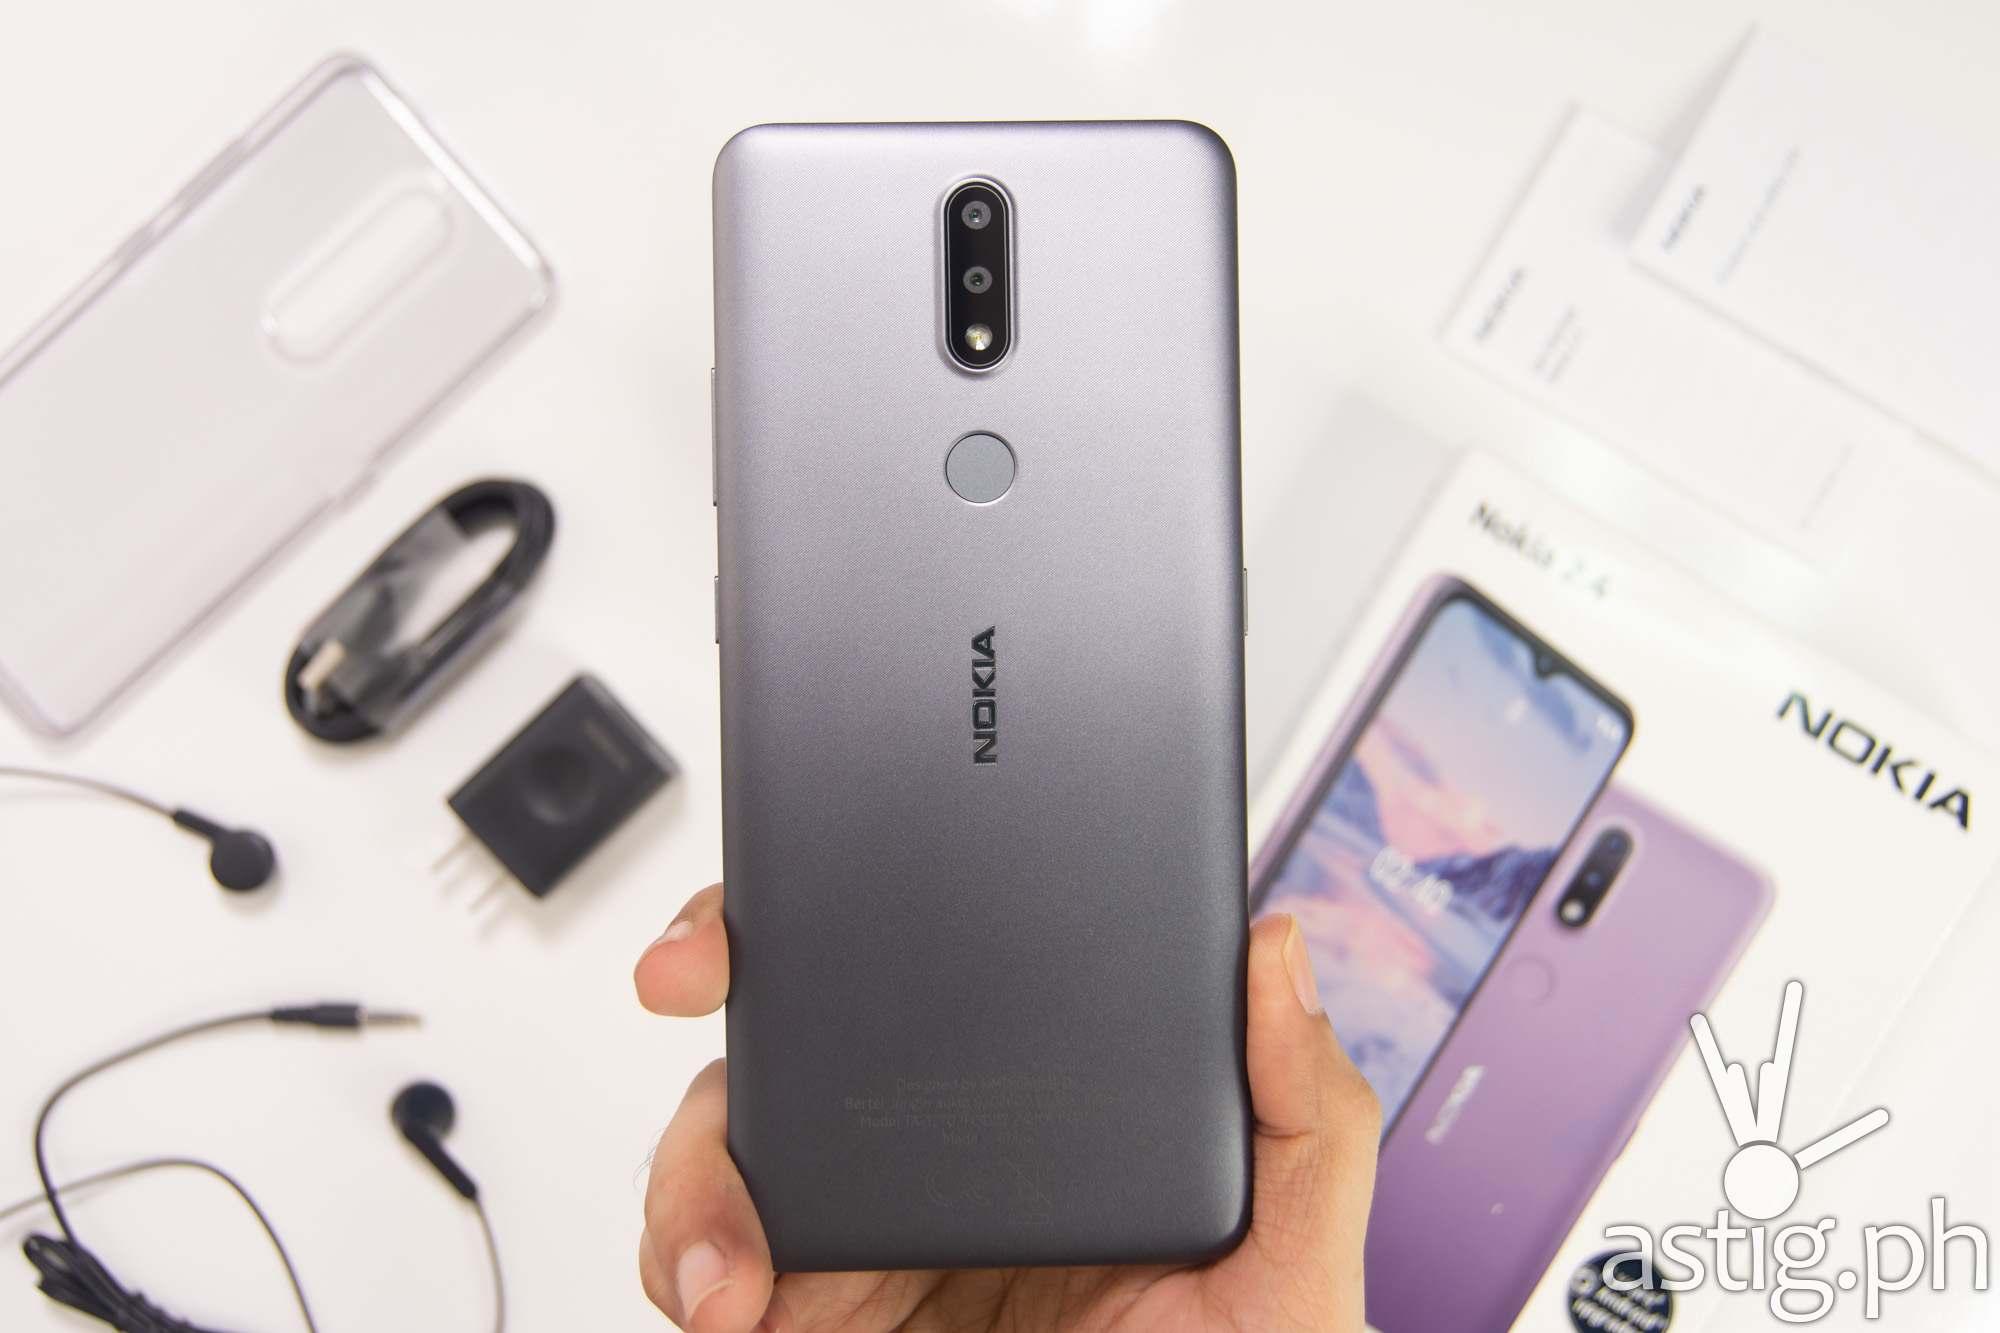 Back handheld - Nokia 2.4 (Philippines)